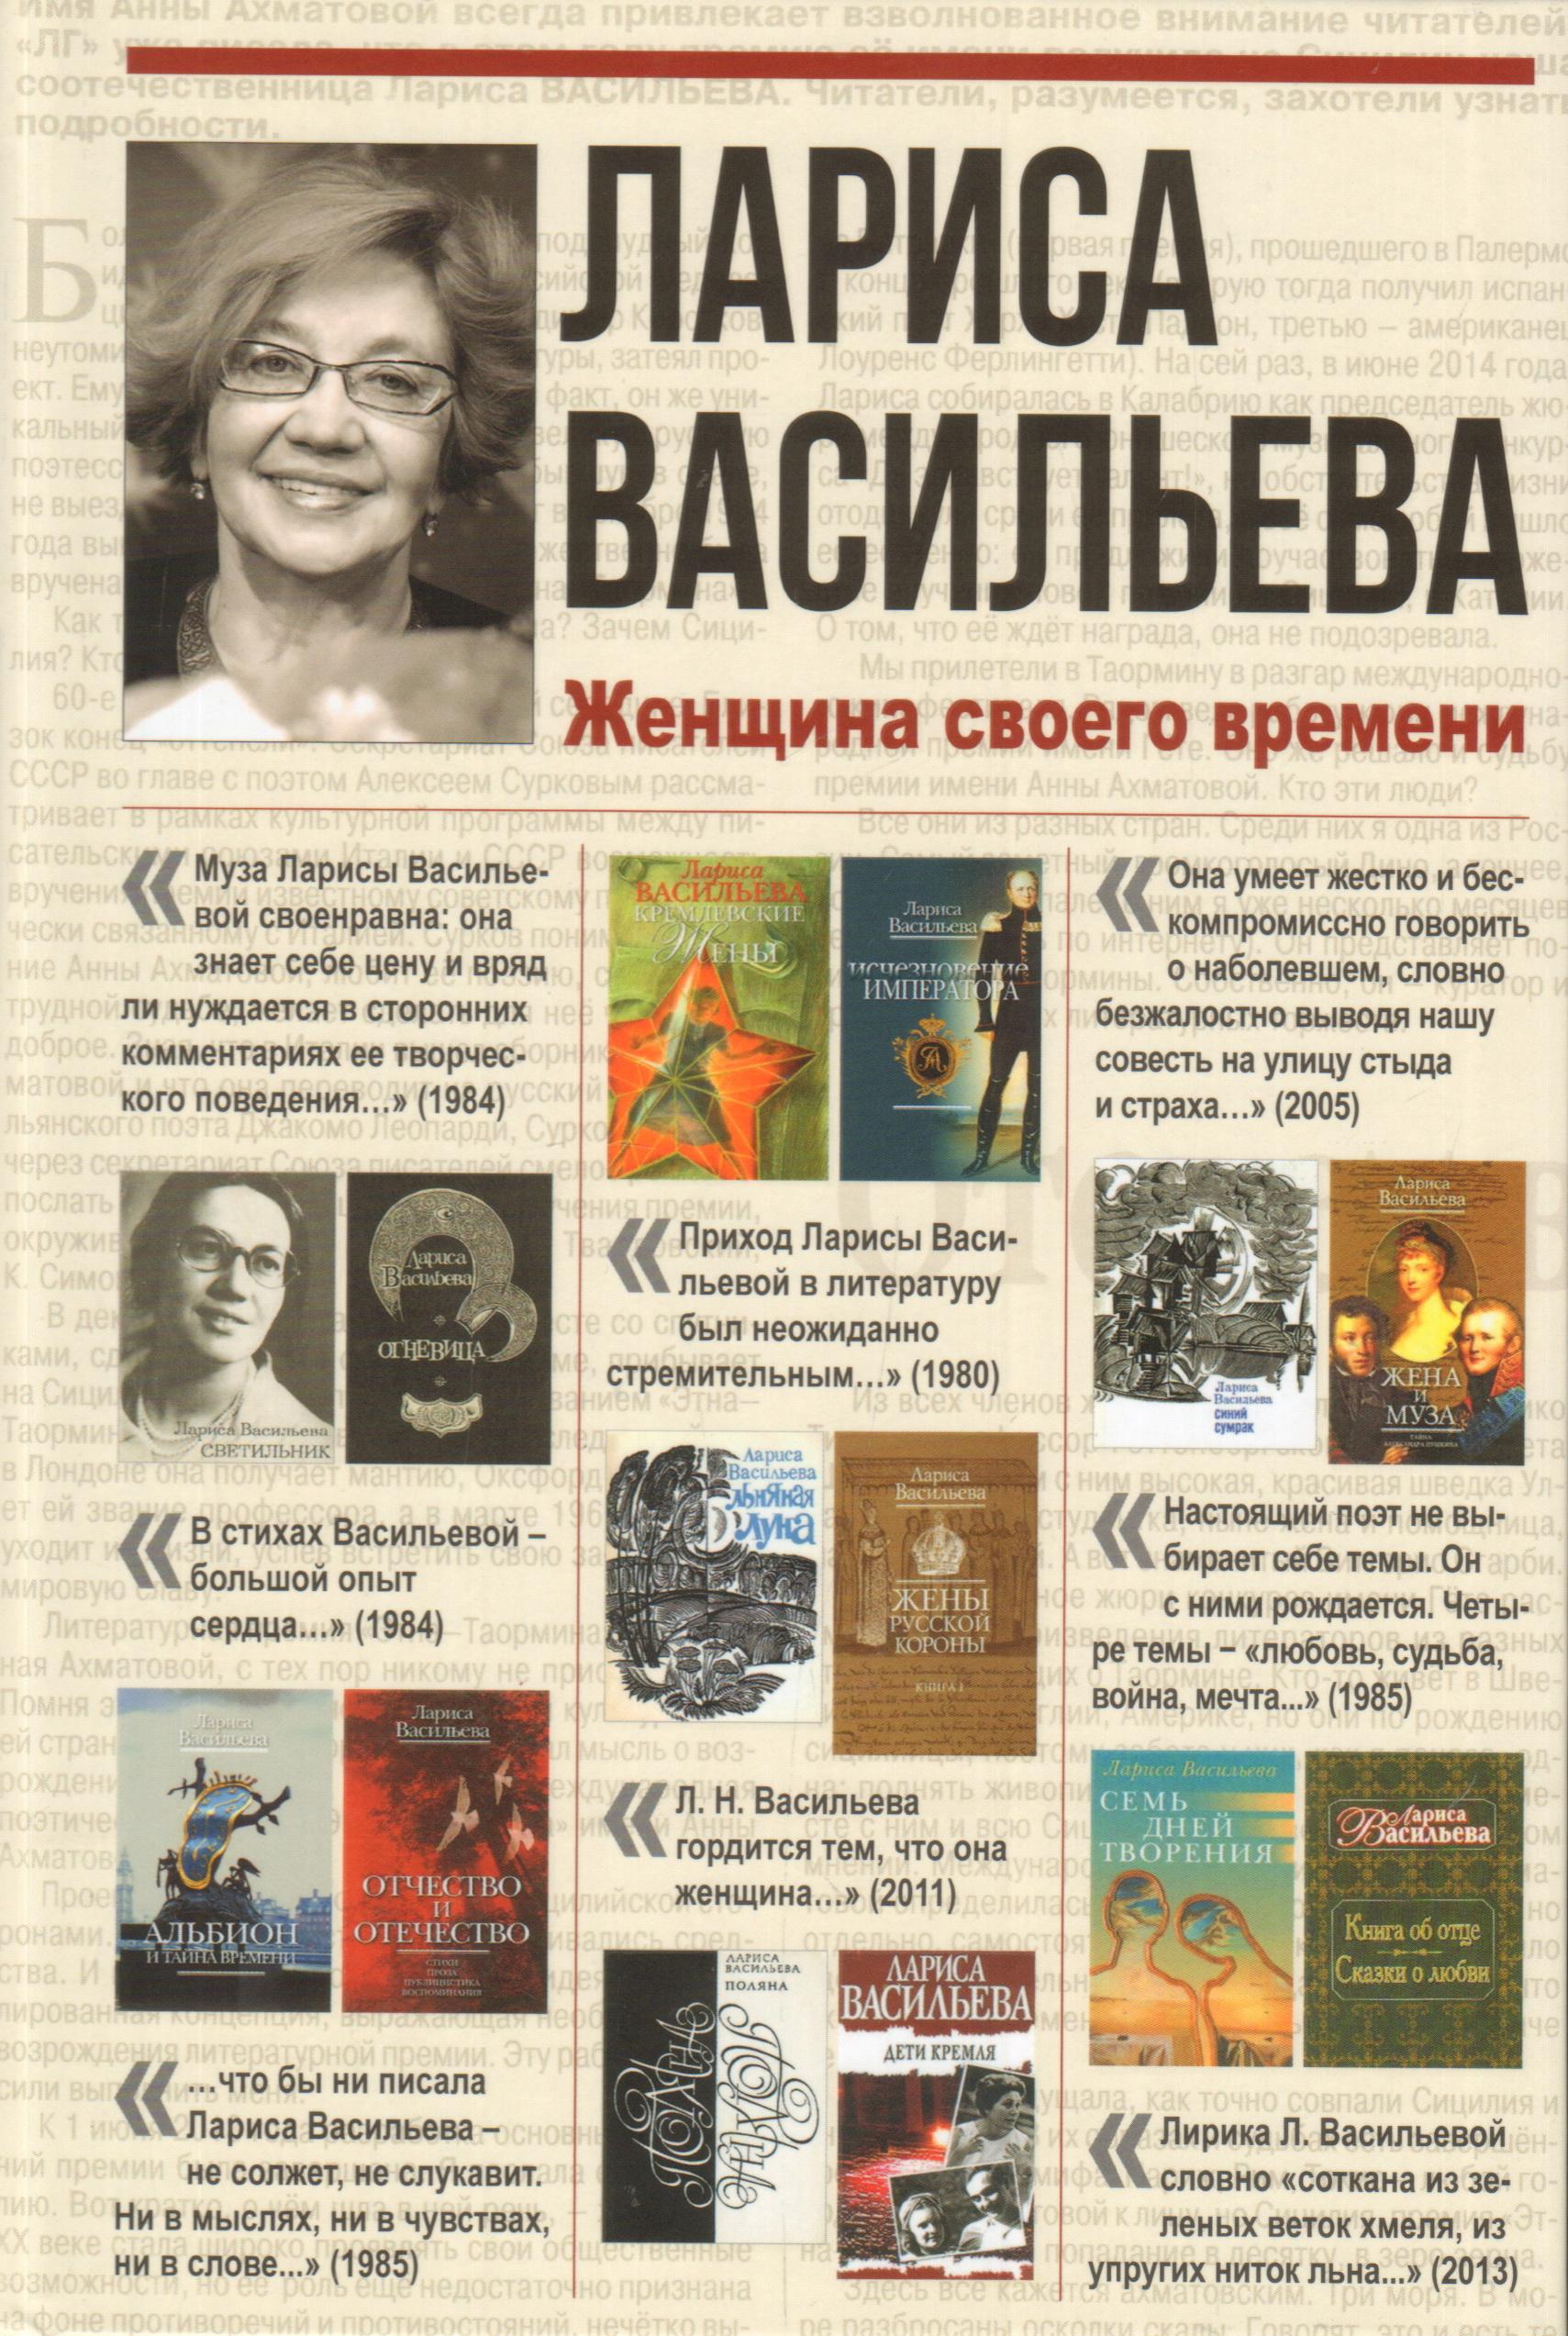 Лариса Васильева. Женщина своего времени.